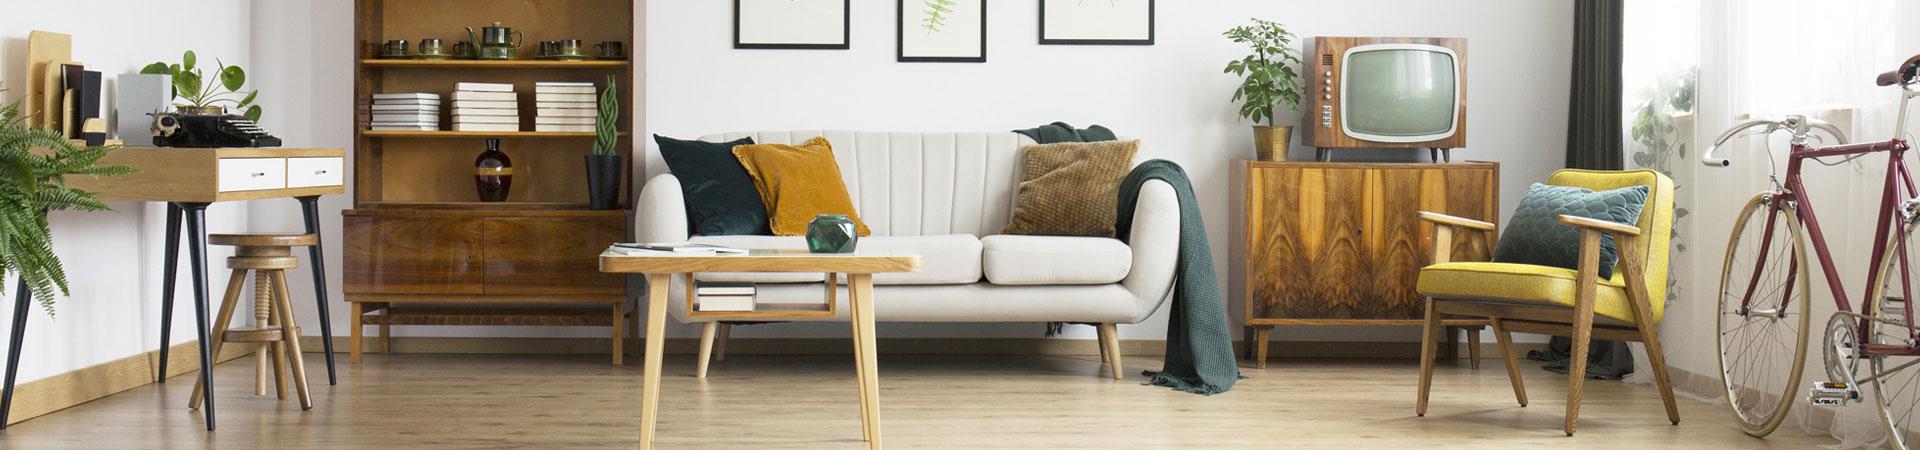 Contemporary Furniture - Retro, Scandinavian and Mid-Century